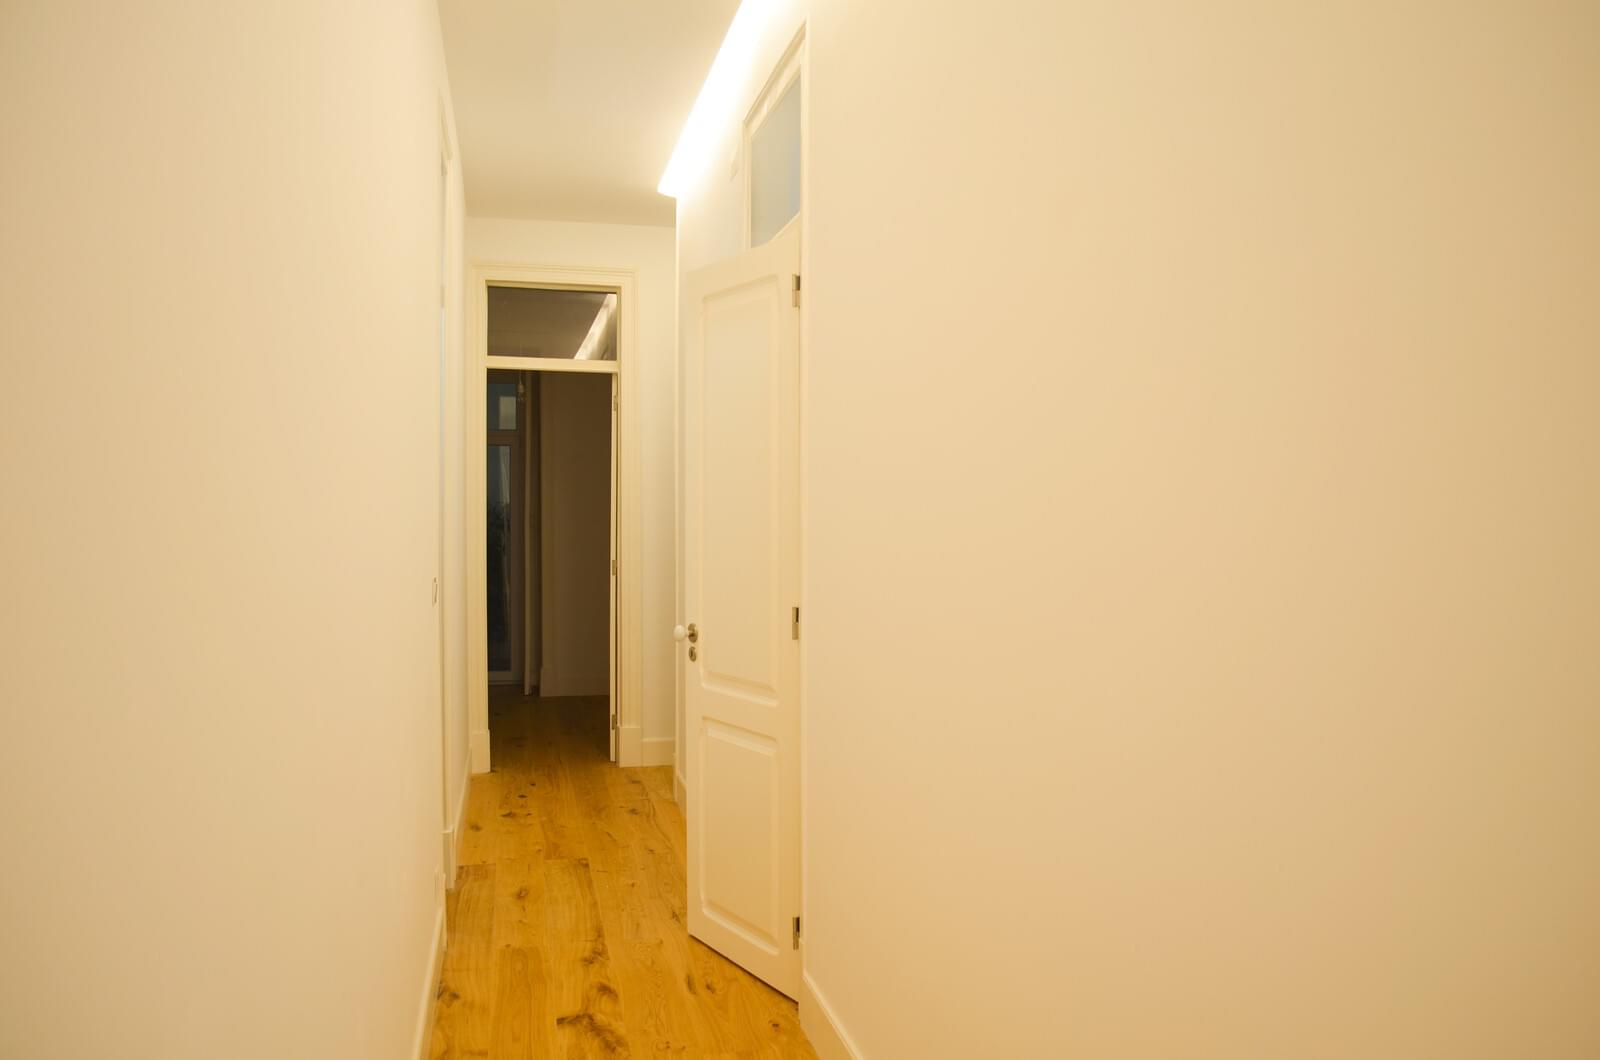 pf18801-apartamento-t2-lisboa-fd5f7977-bec6-407c-b314-9120568b2b22